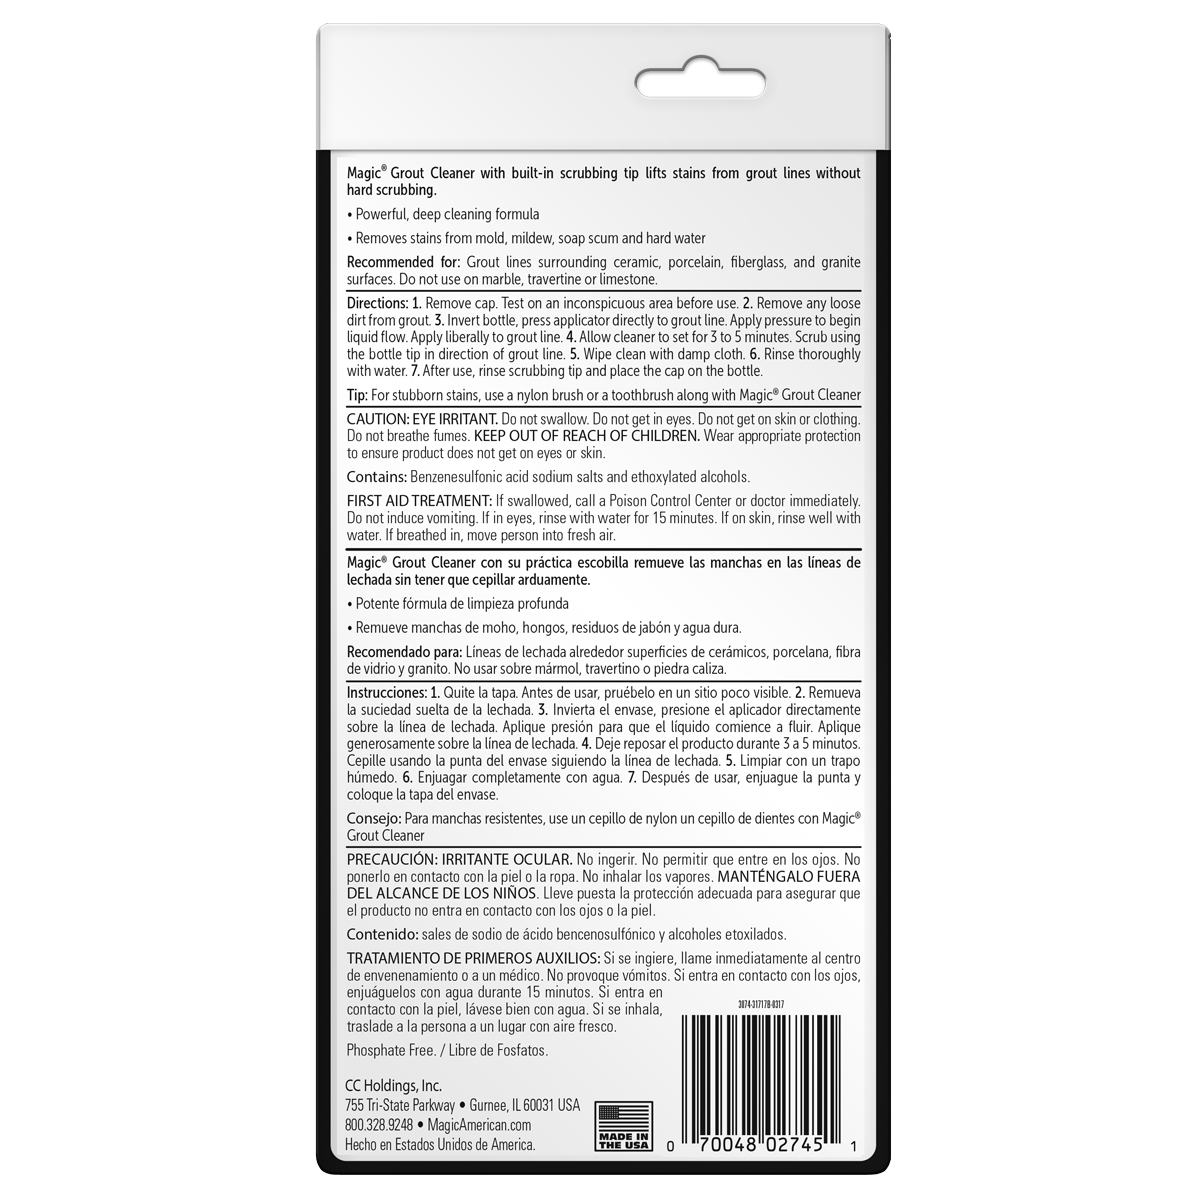 https://googone.com/media/catalog/product/g/r/grout-cleaner-scrubbing-tip_back.png